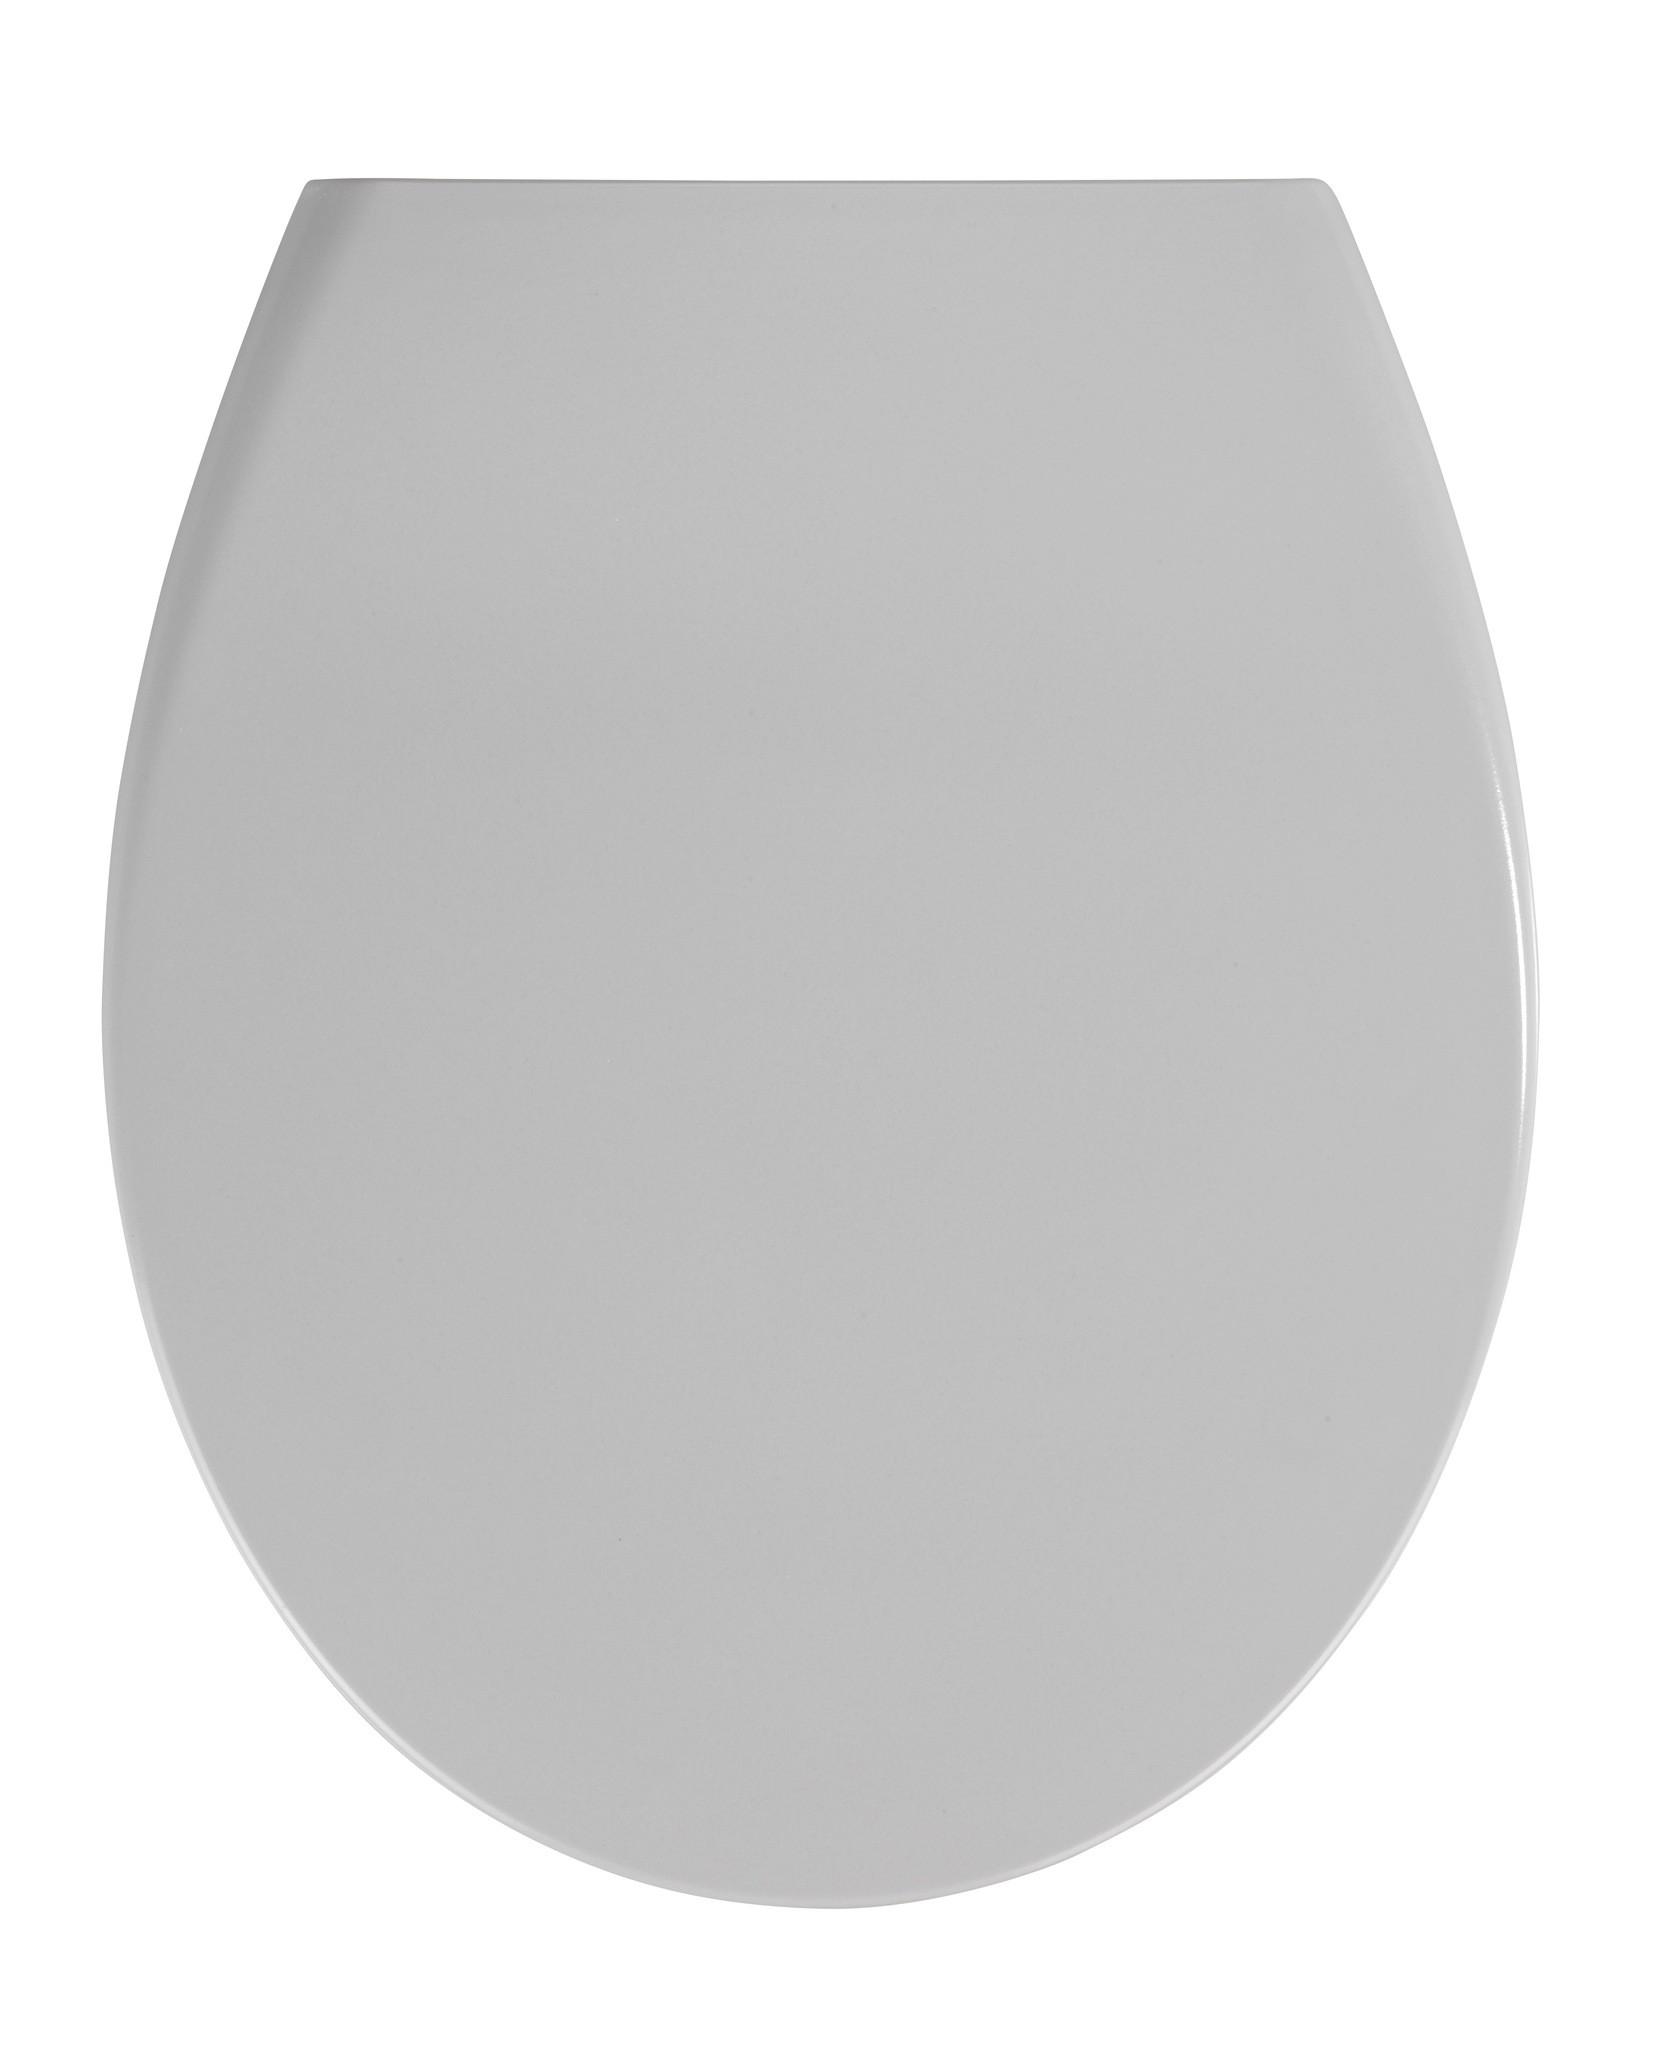 Premium WC-Sitz Samos Concrete Grey, Duroplast, mit Absenkautomatik